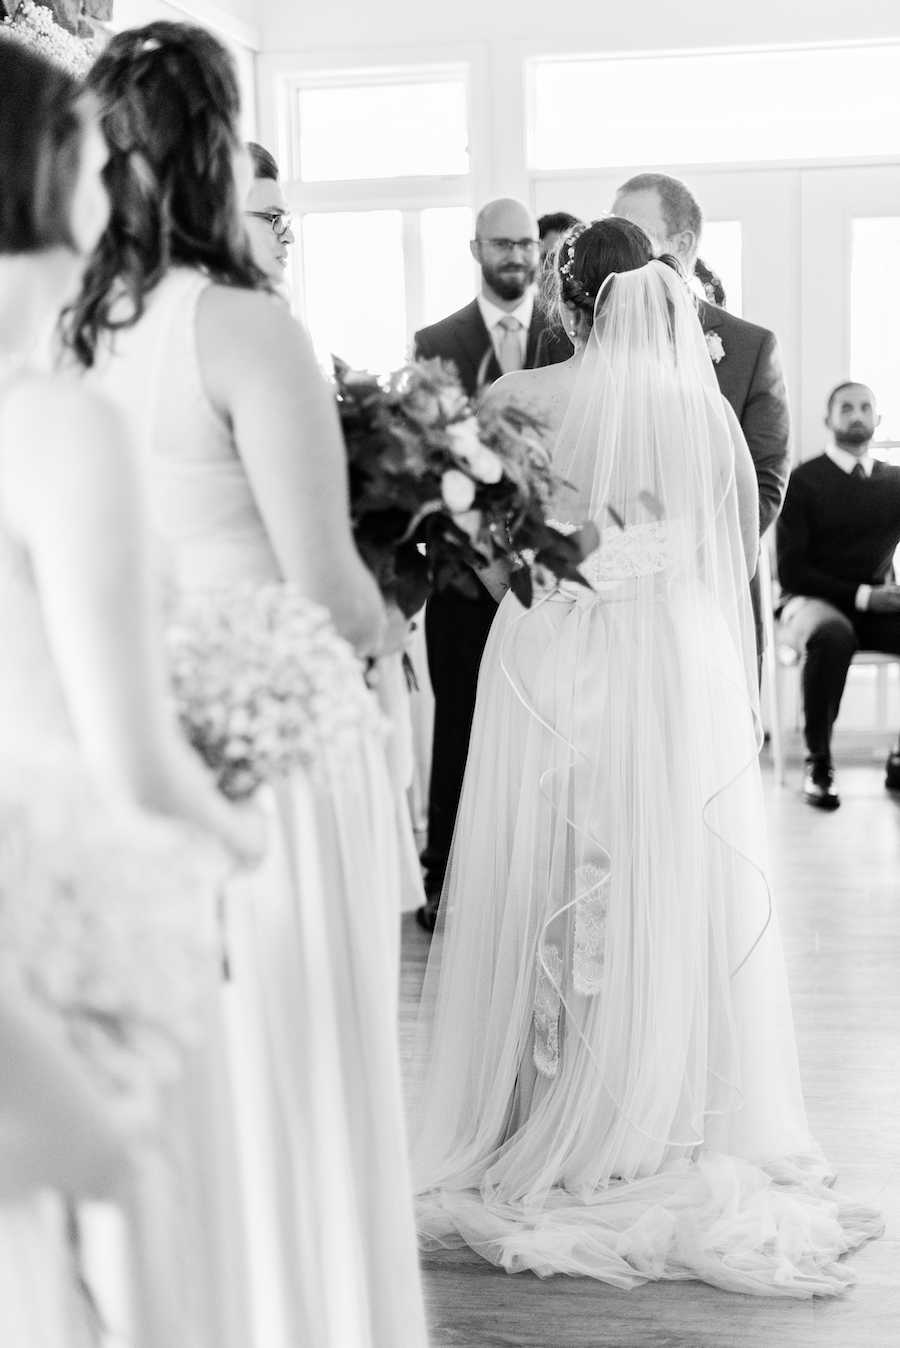 Wedding ceremony at a camp blodgett wedding